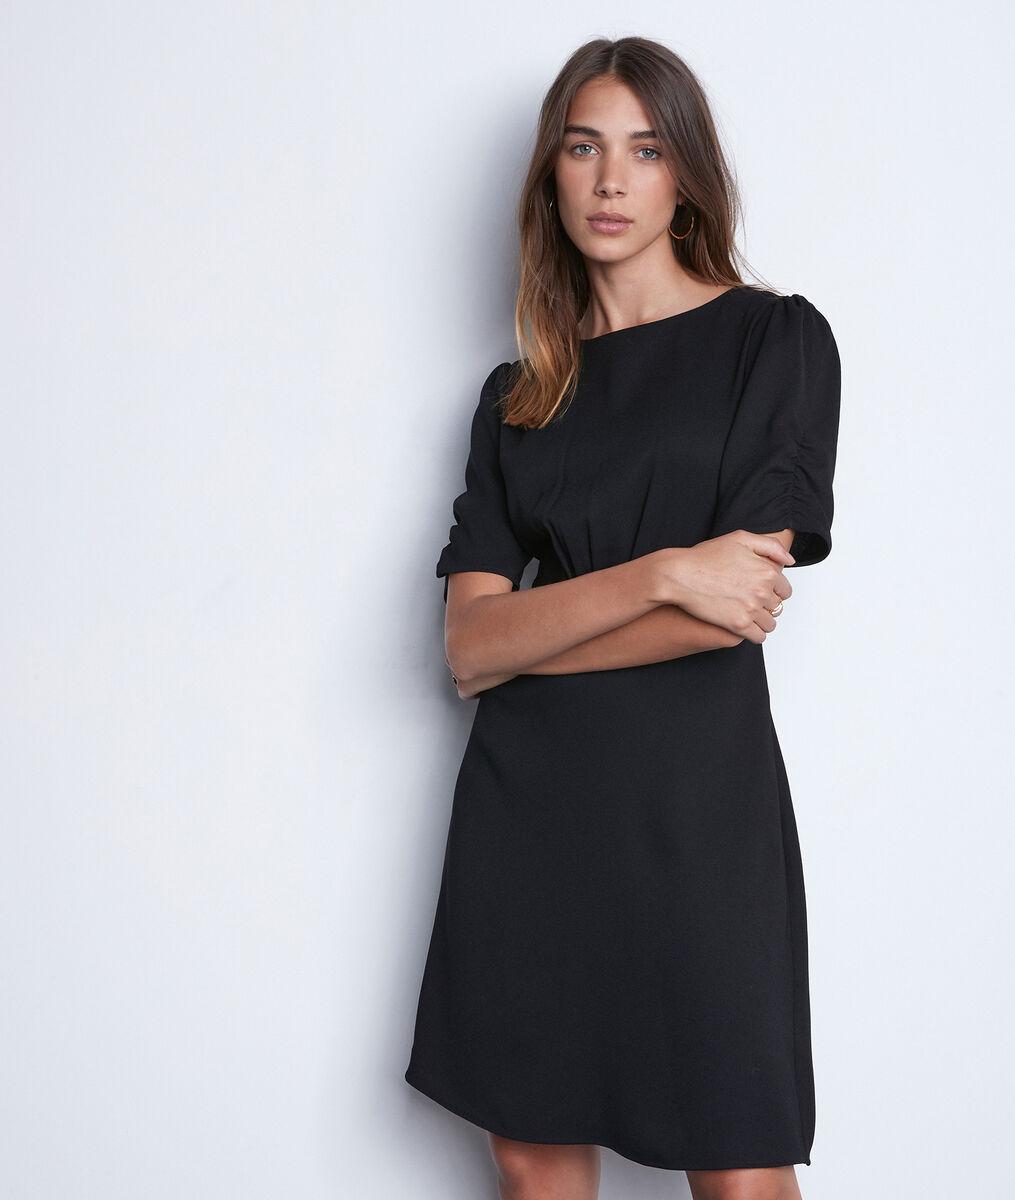 Petite robe noire courte Sally PhotoZ | 1-2-3